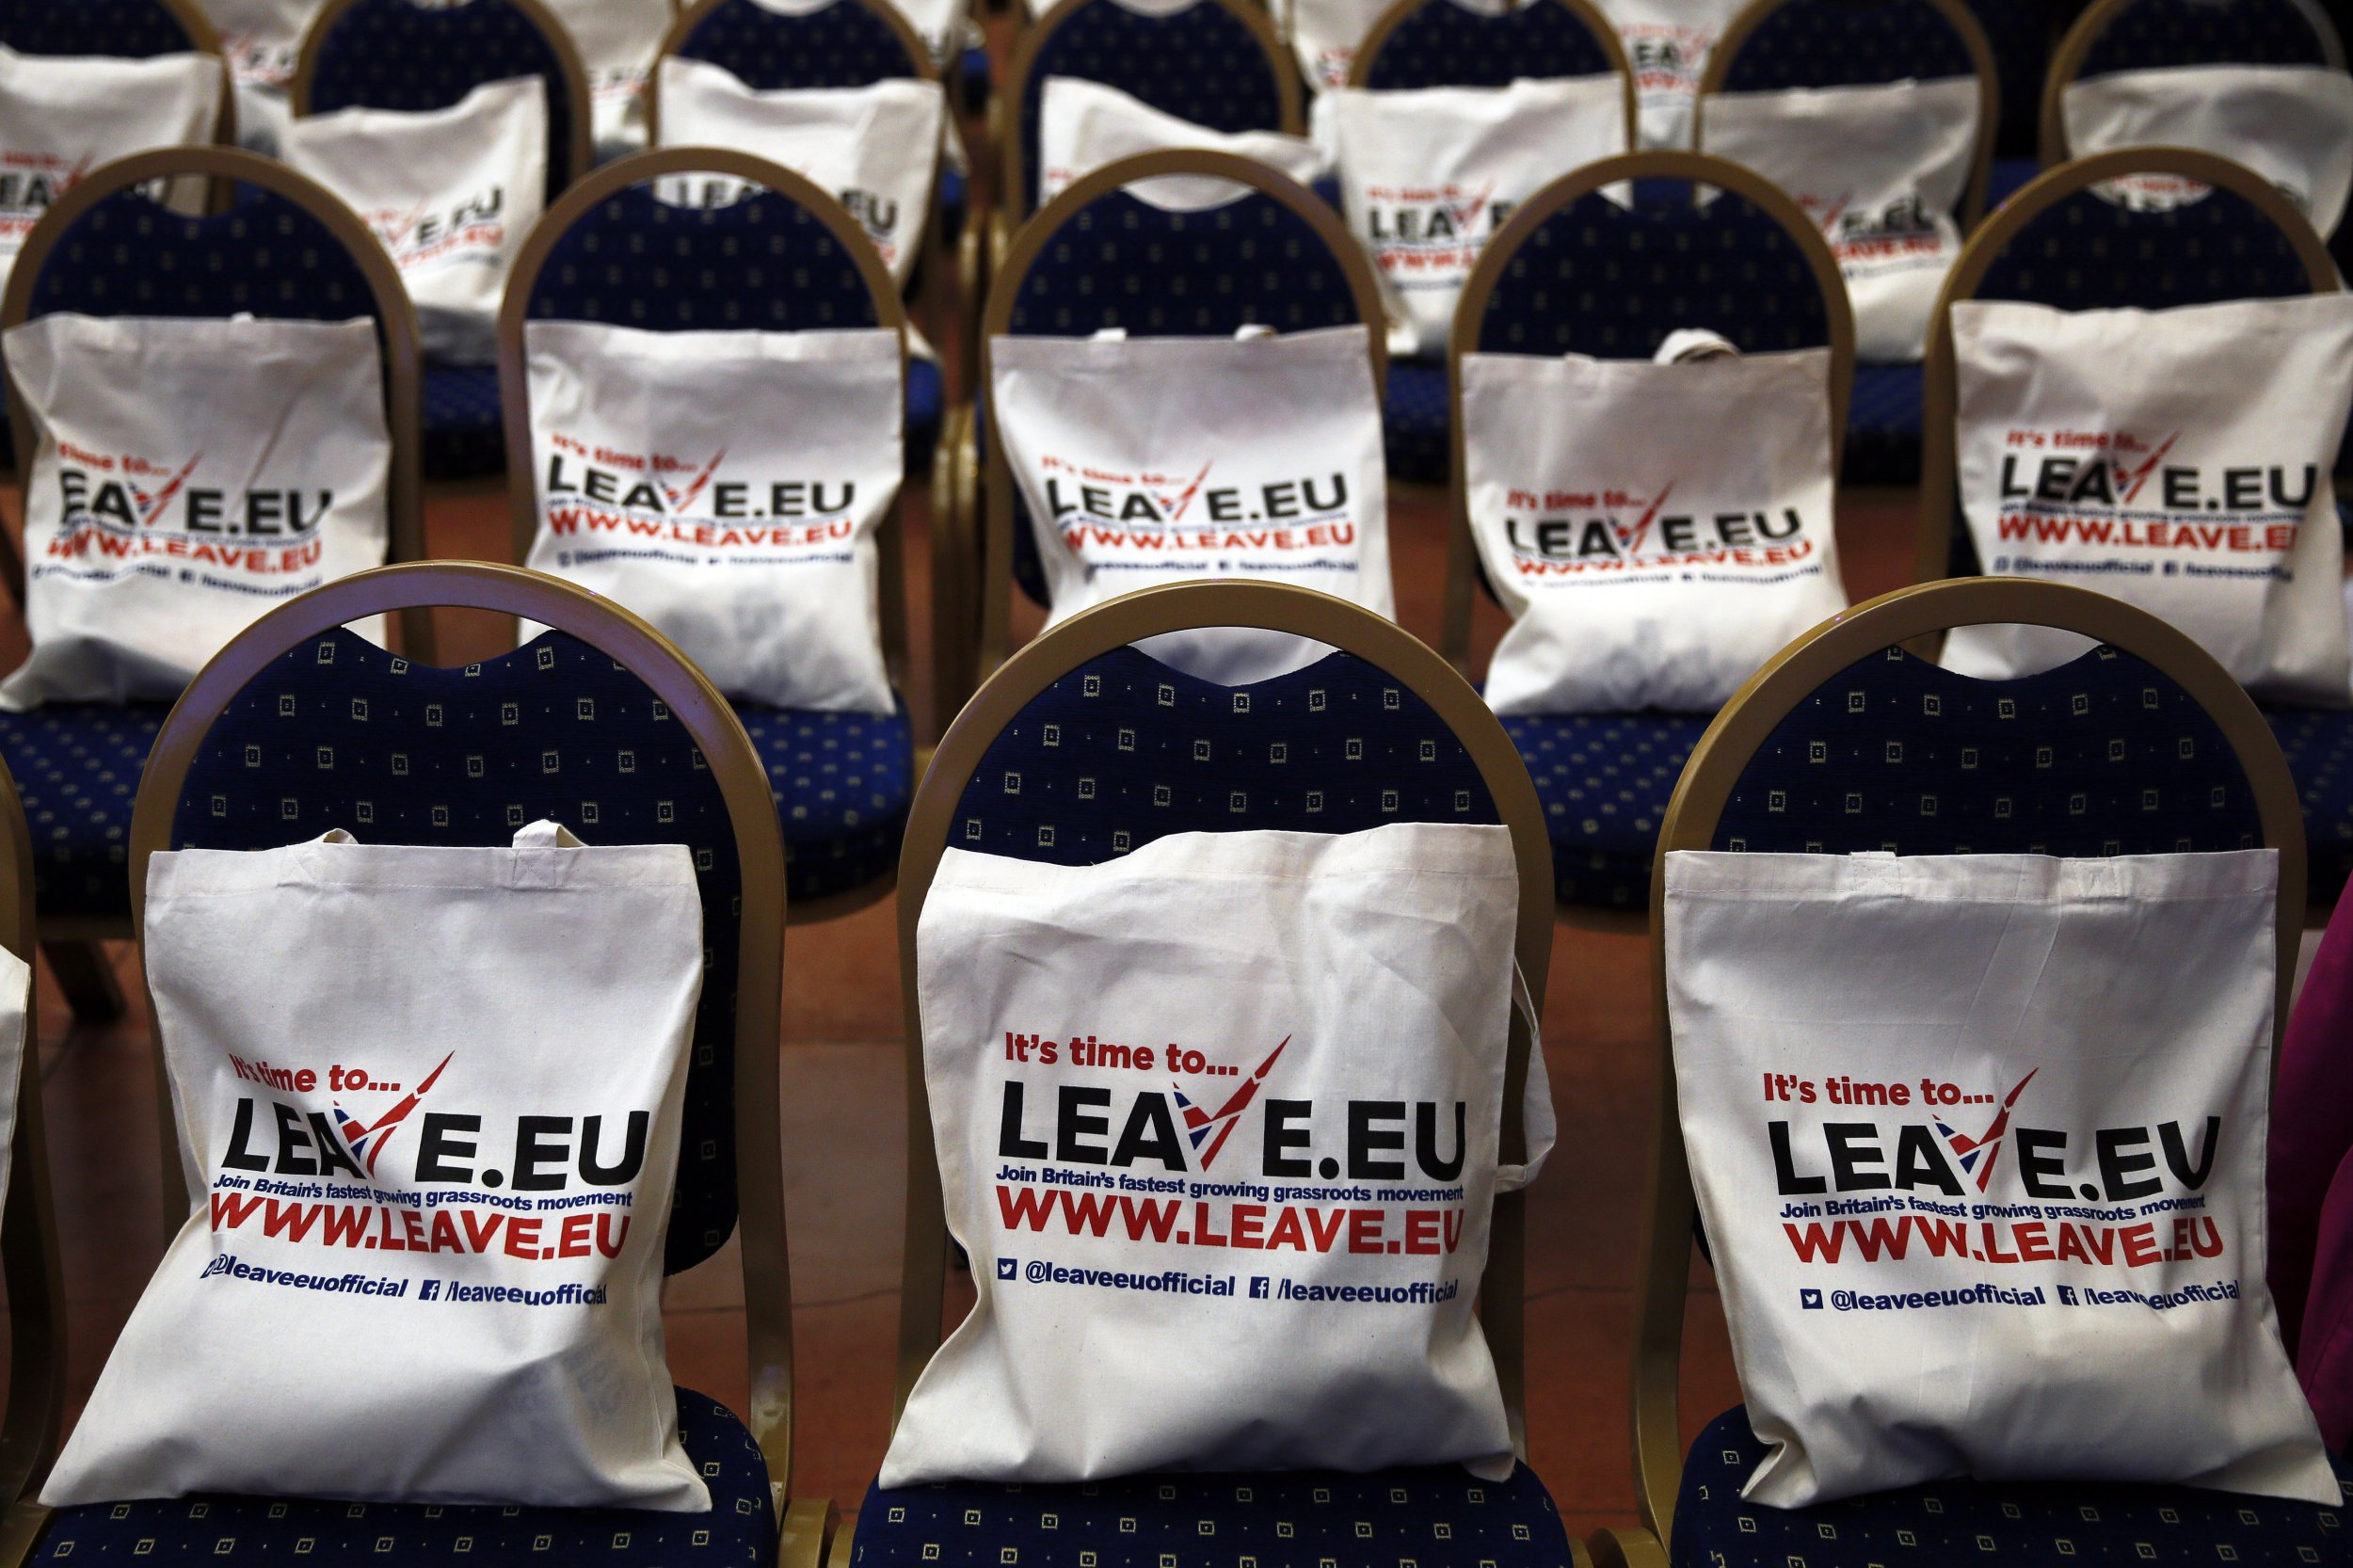 Leave.eu campaign bags